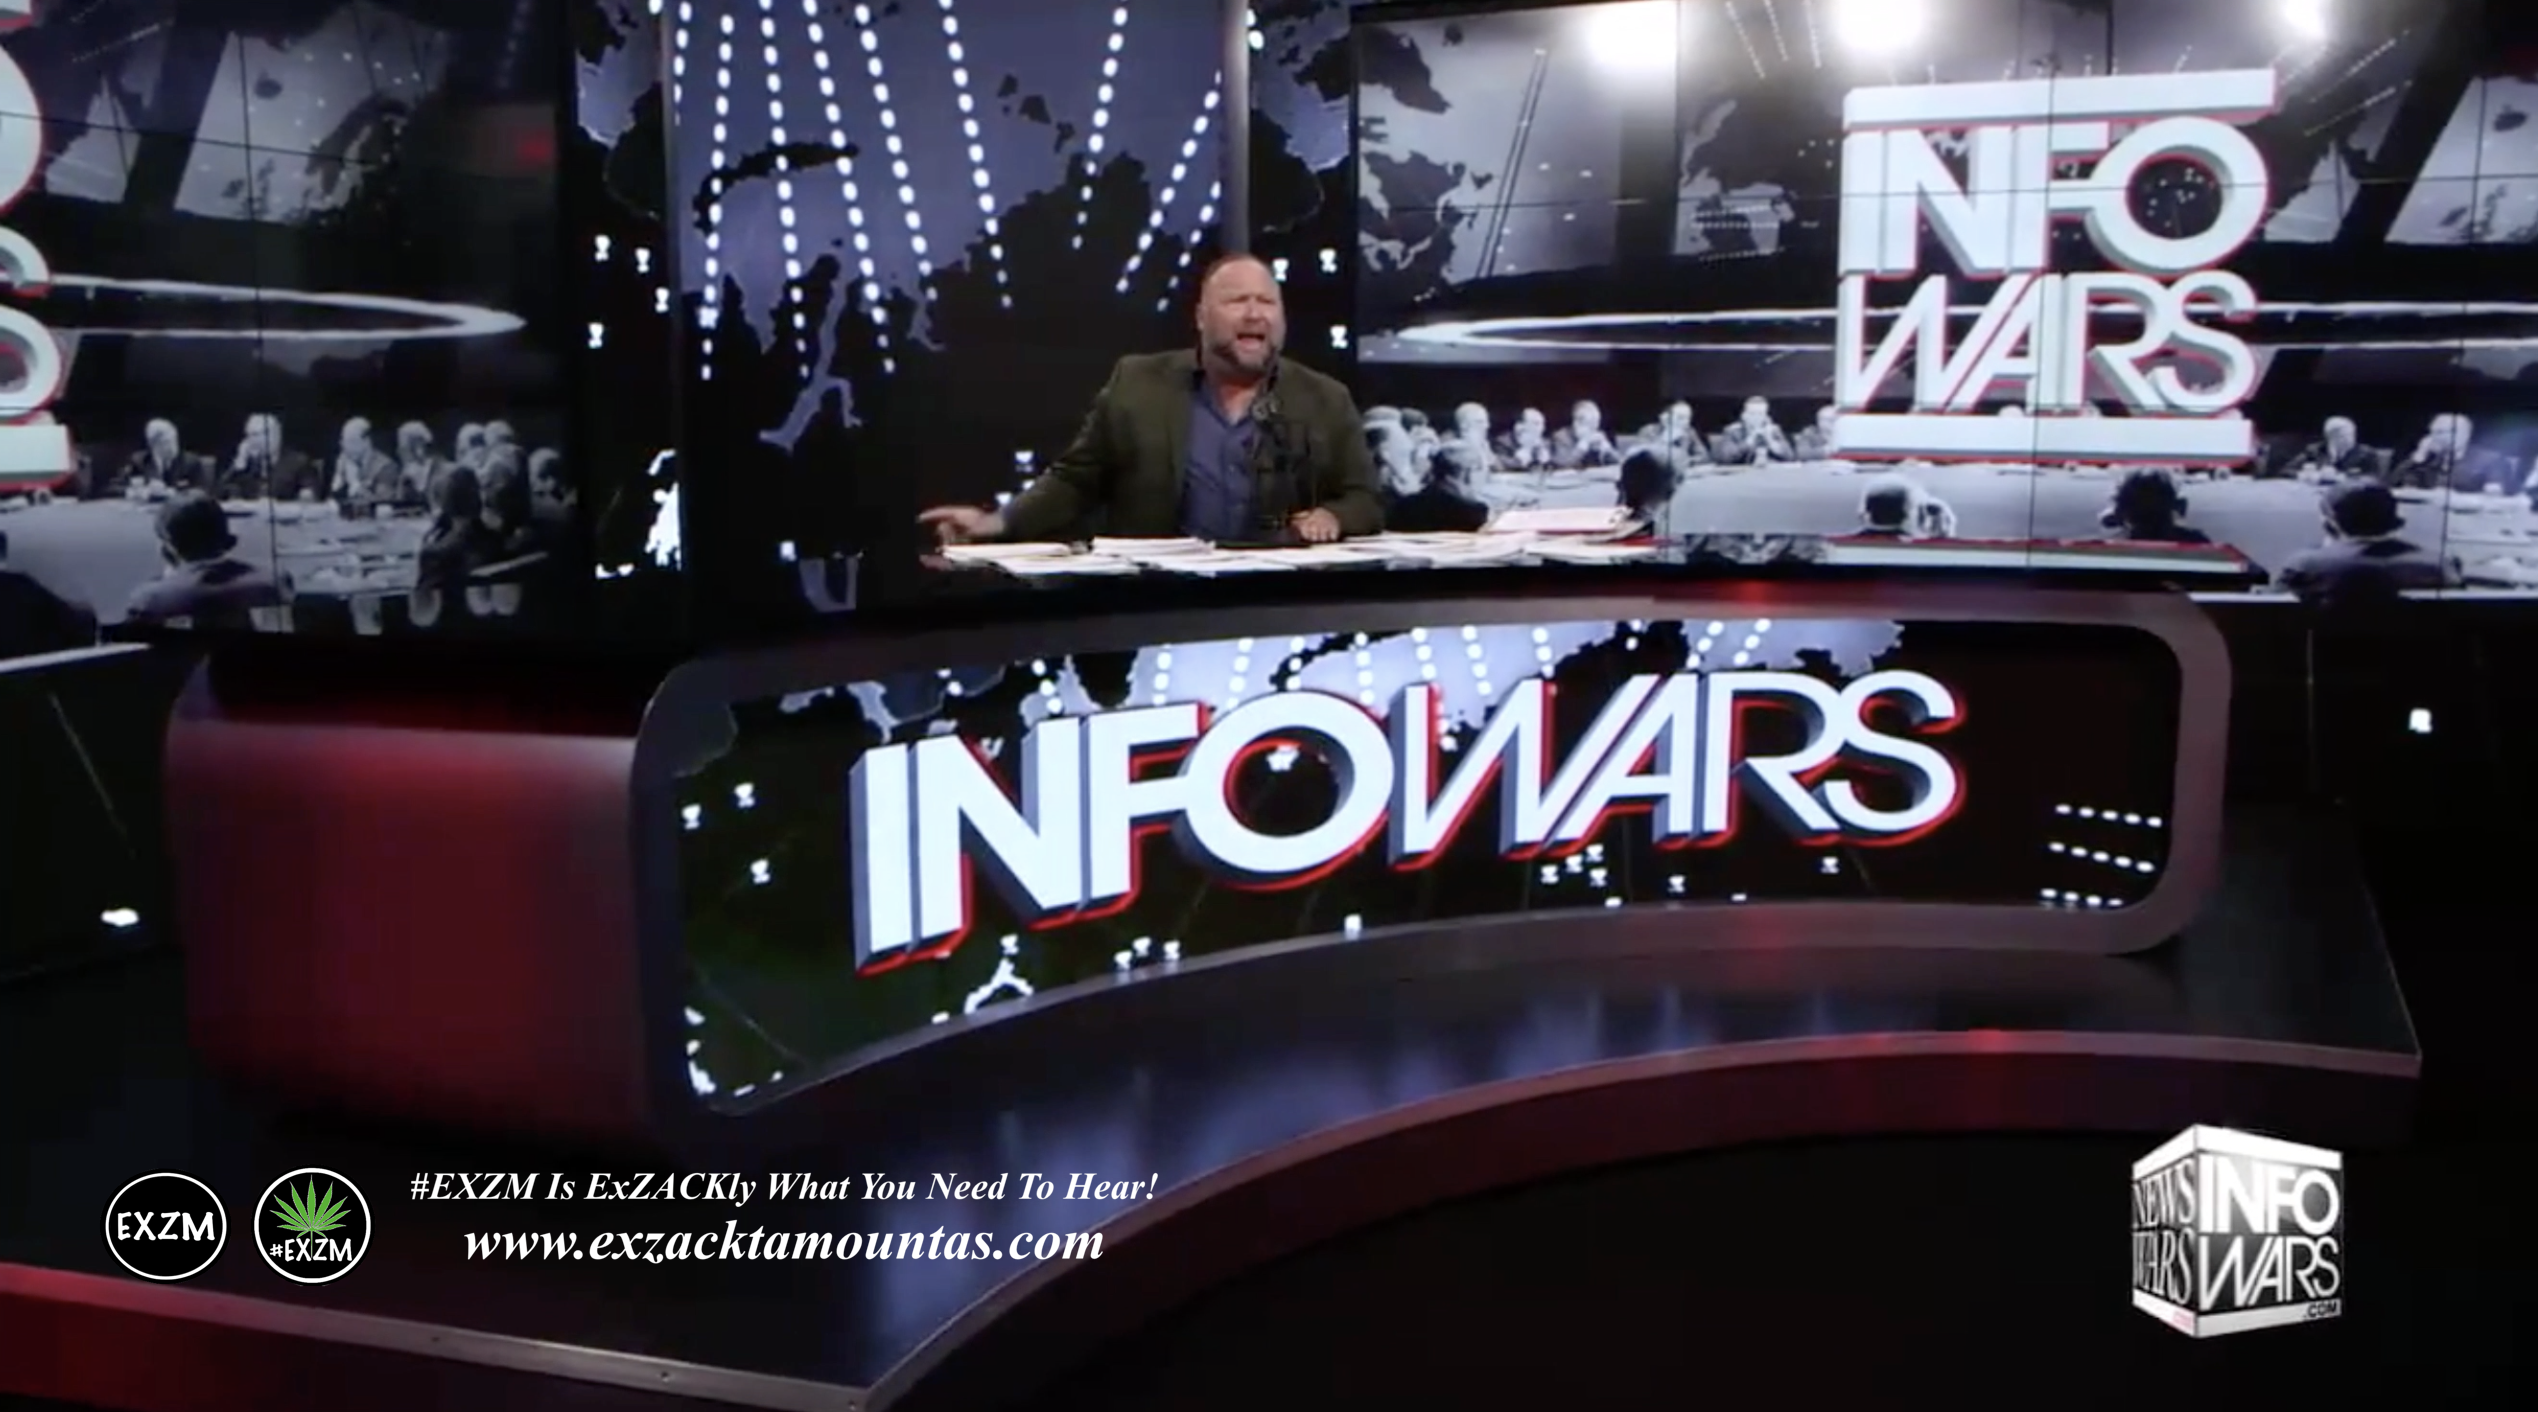 Alex Jones Live Infowars Studio EXZM Zack Mount April 2nd 2021 copy